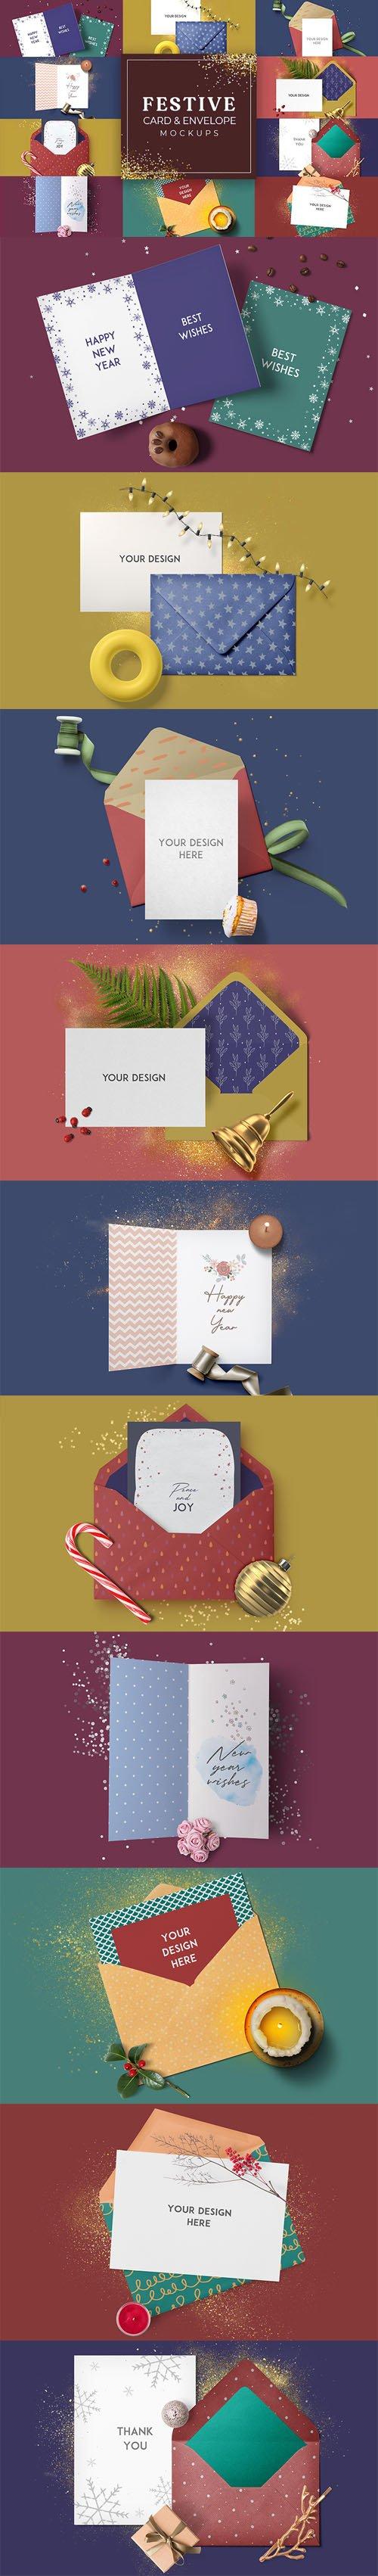 10 Festive Card & Envelope PSD Mockups Templates Collection